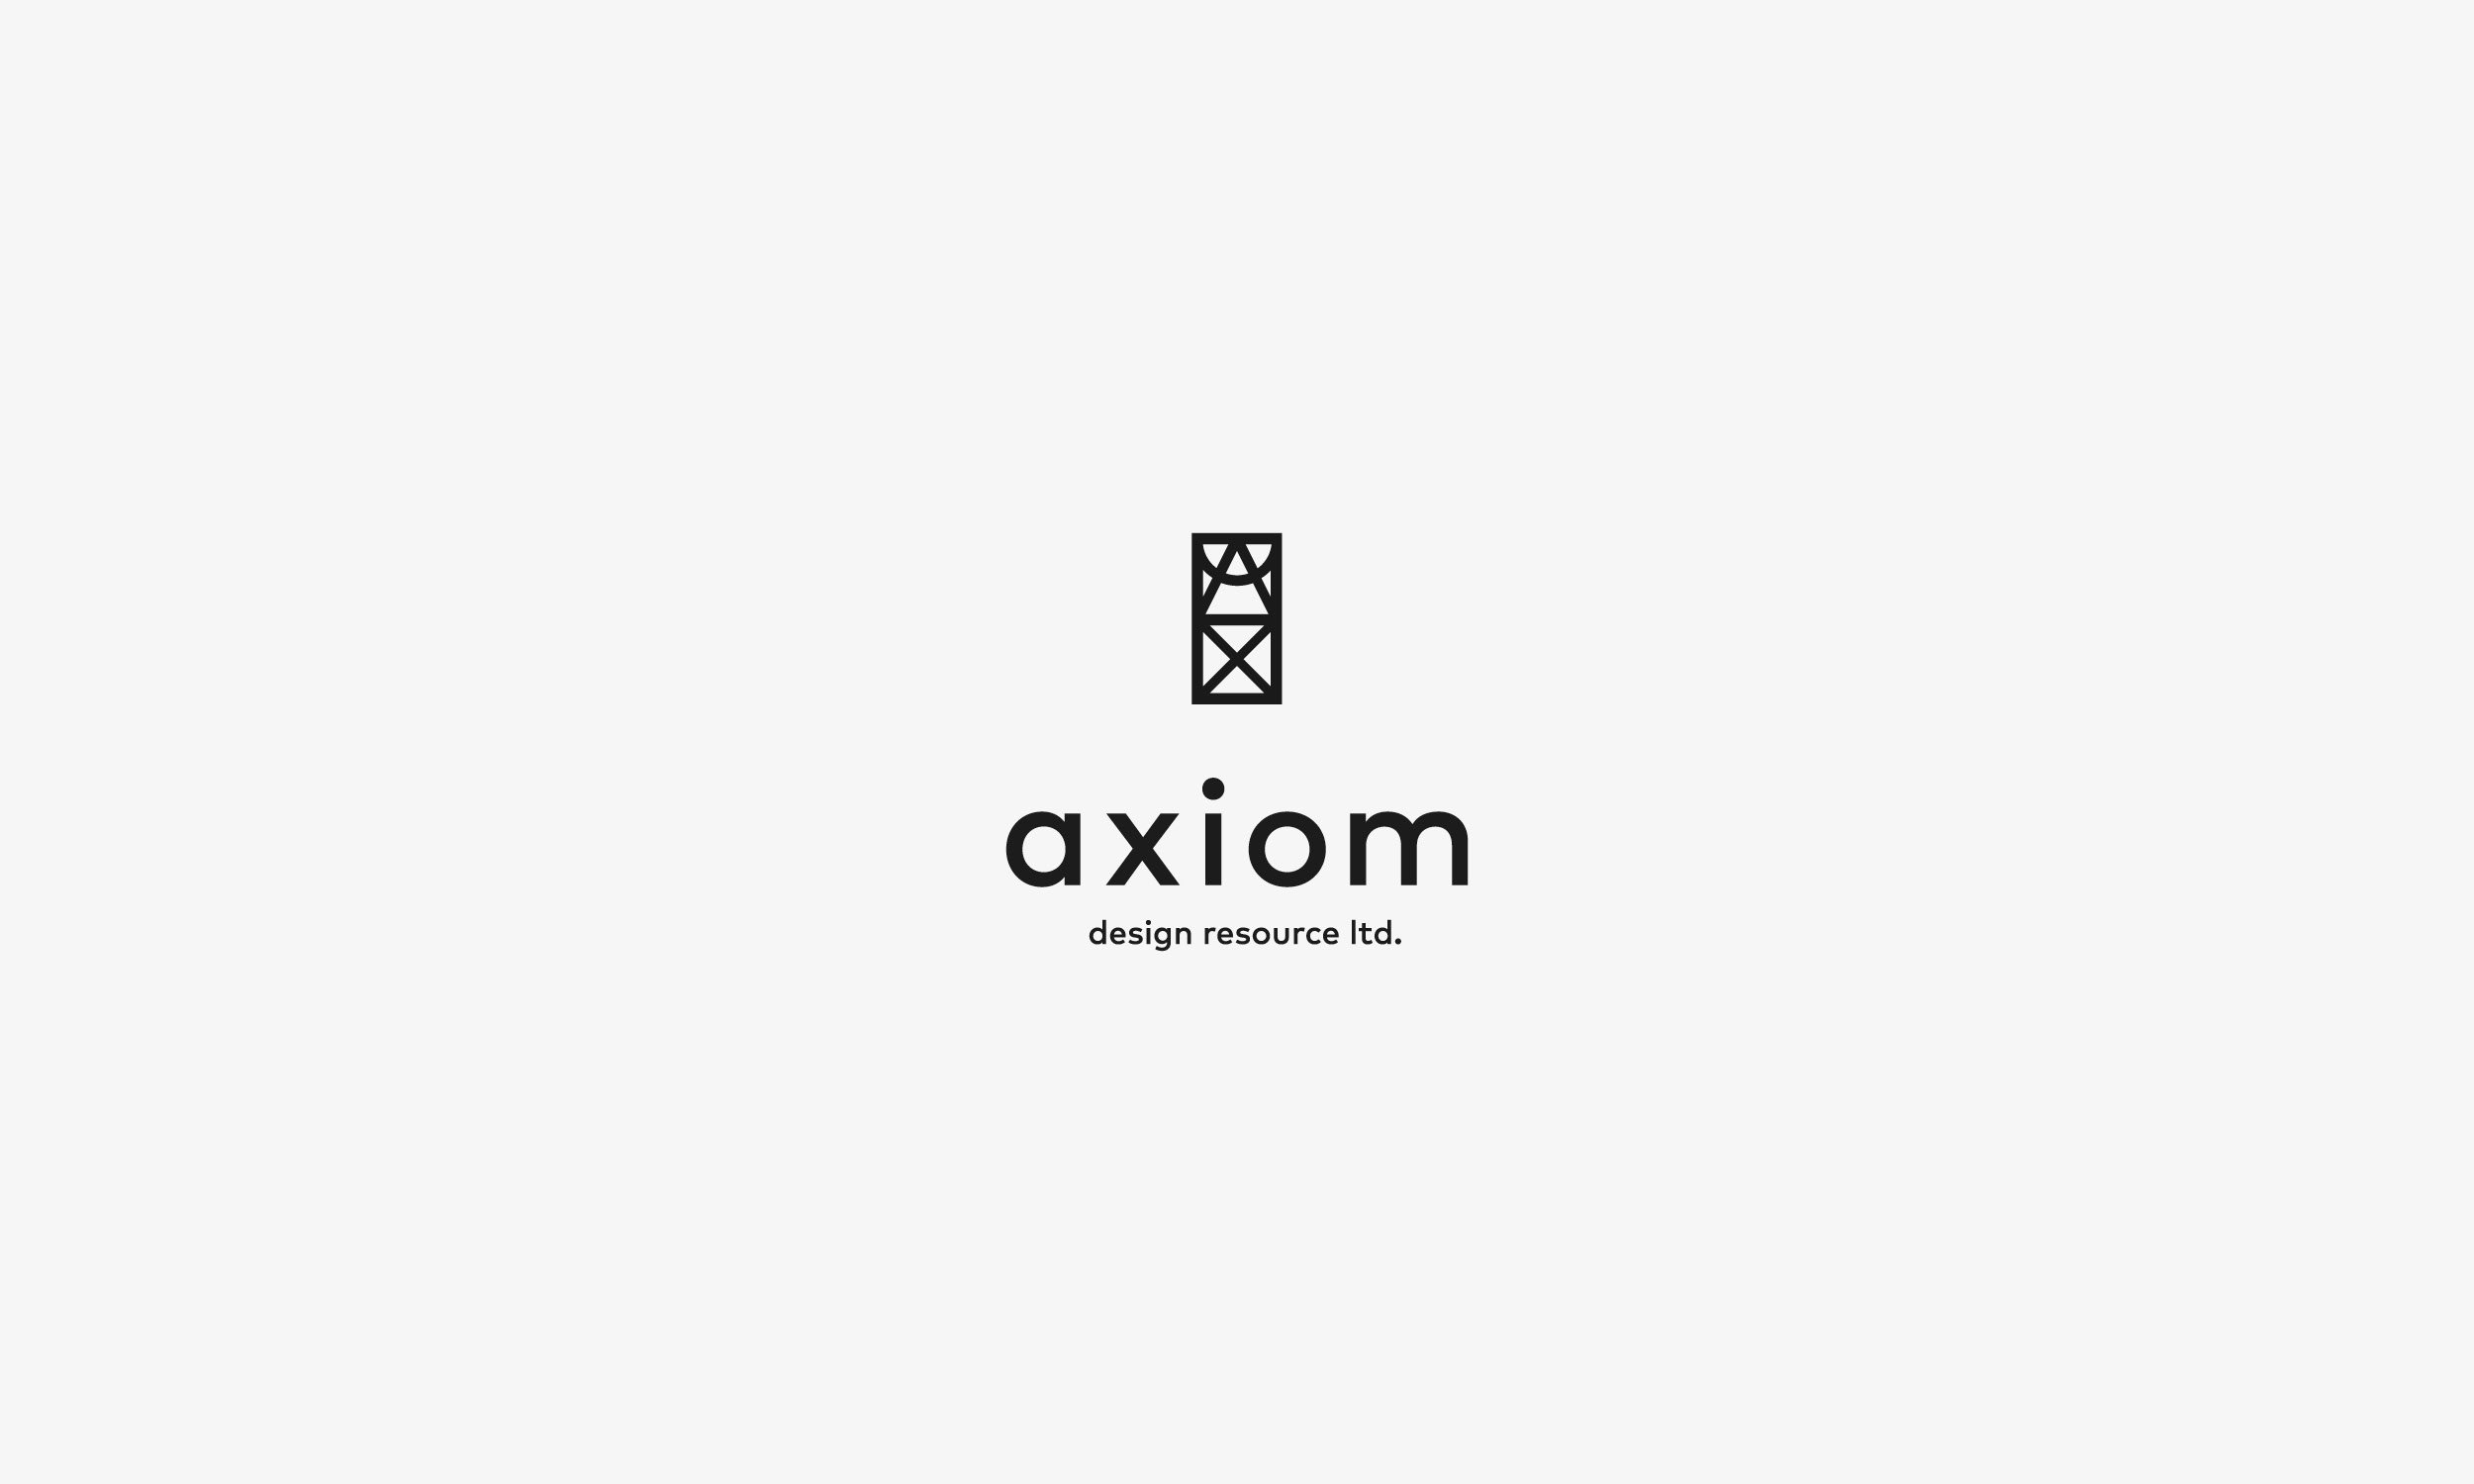 Axiom-Brand-Identity.jpg